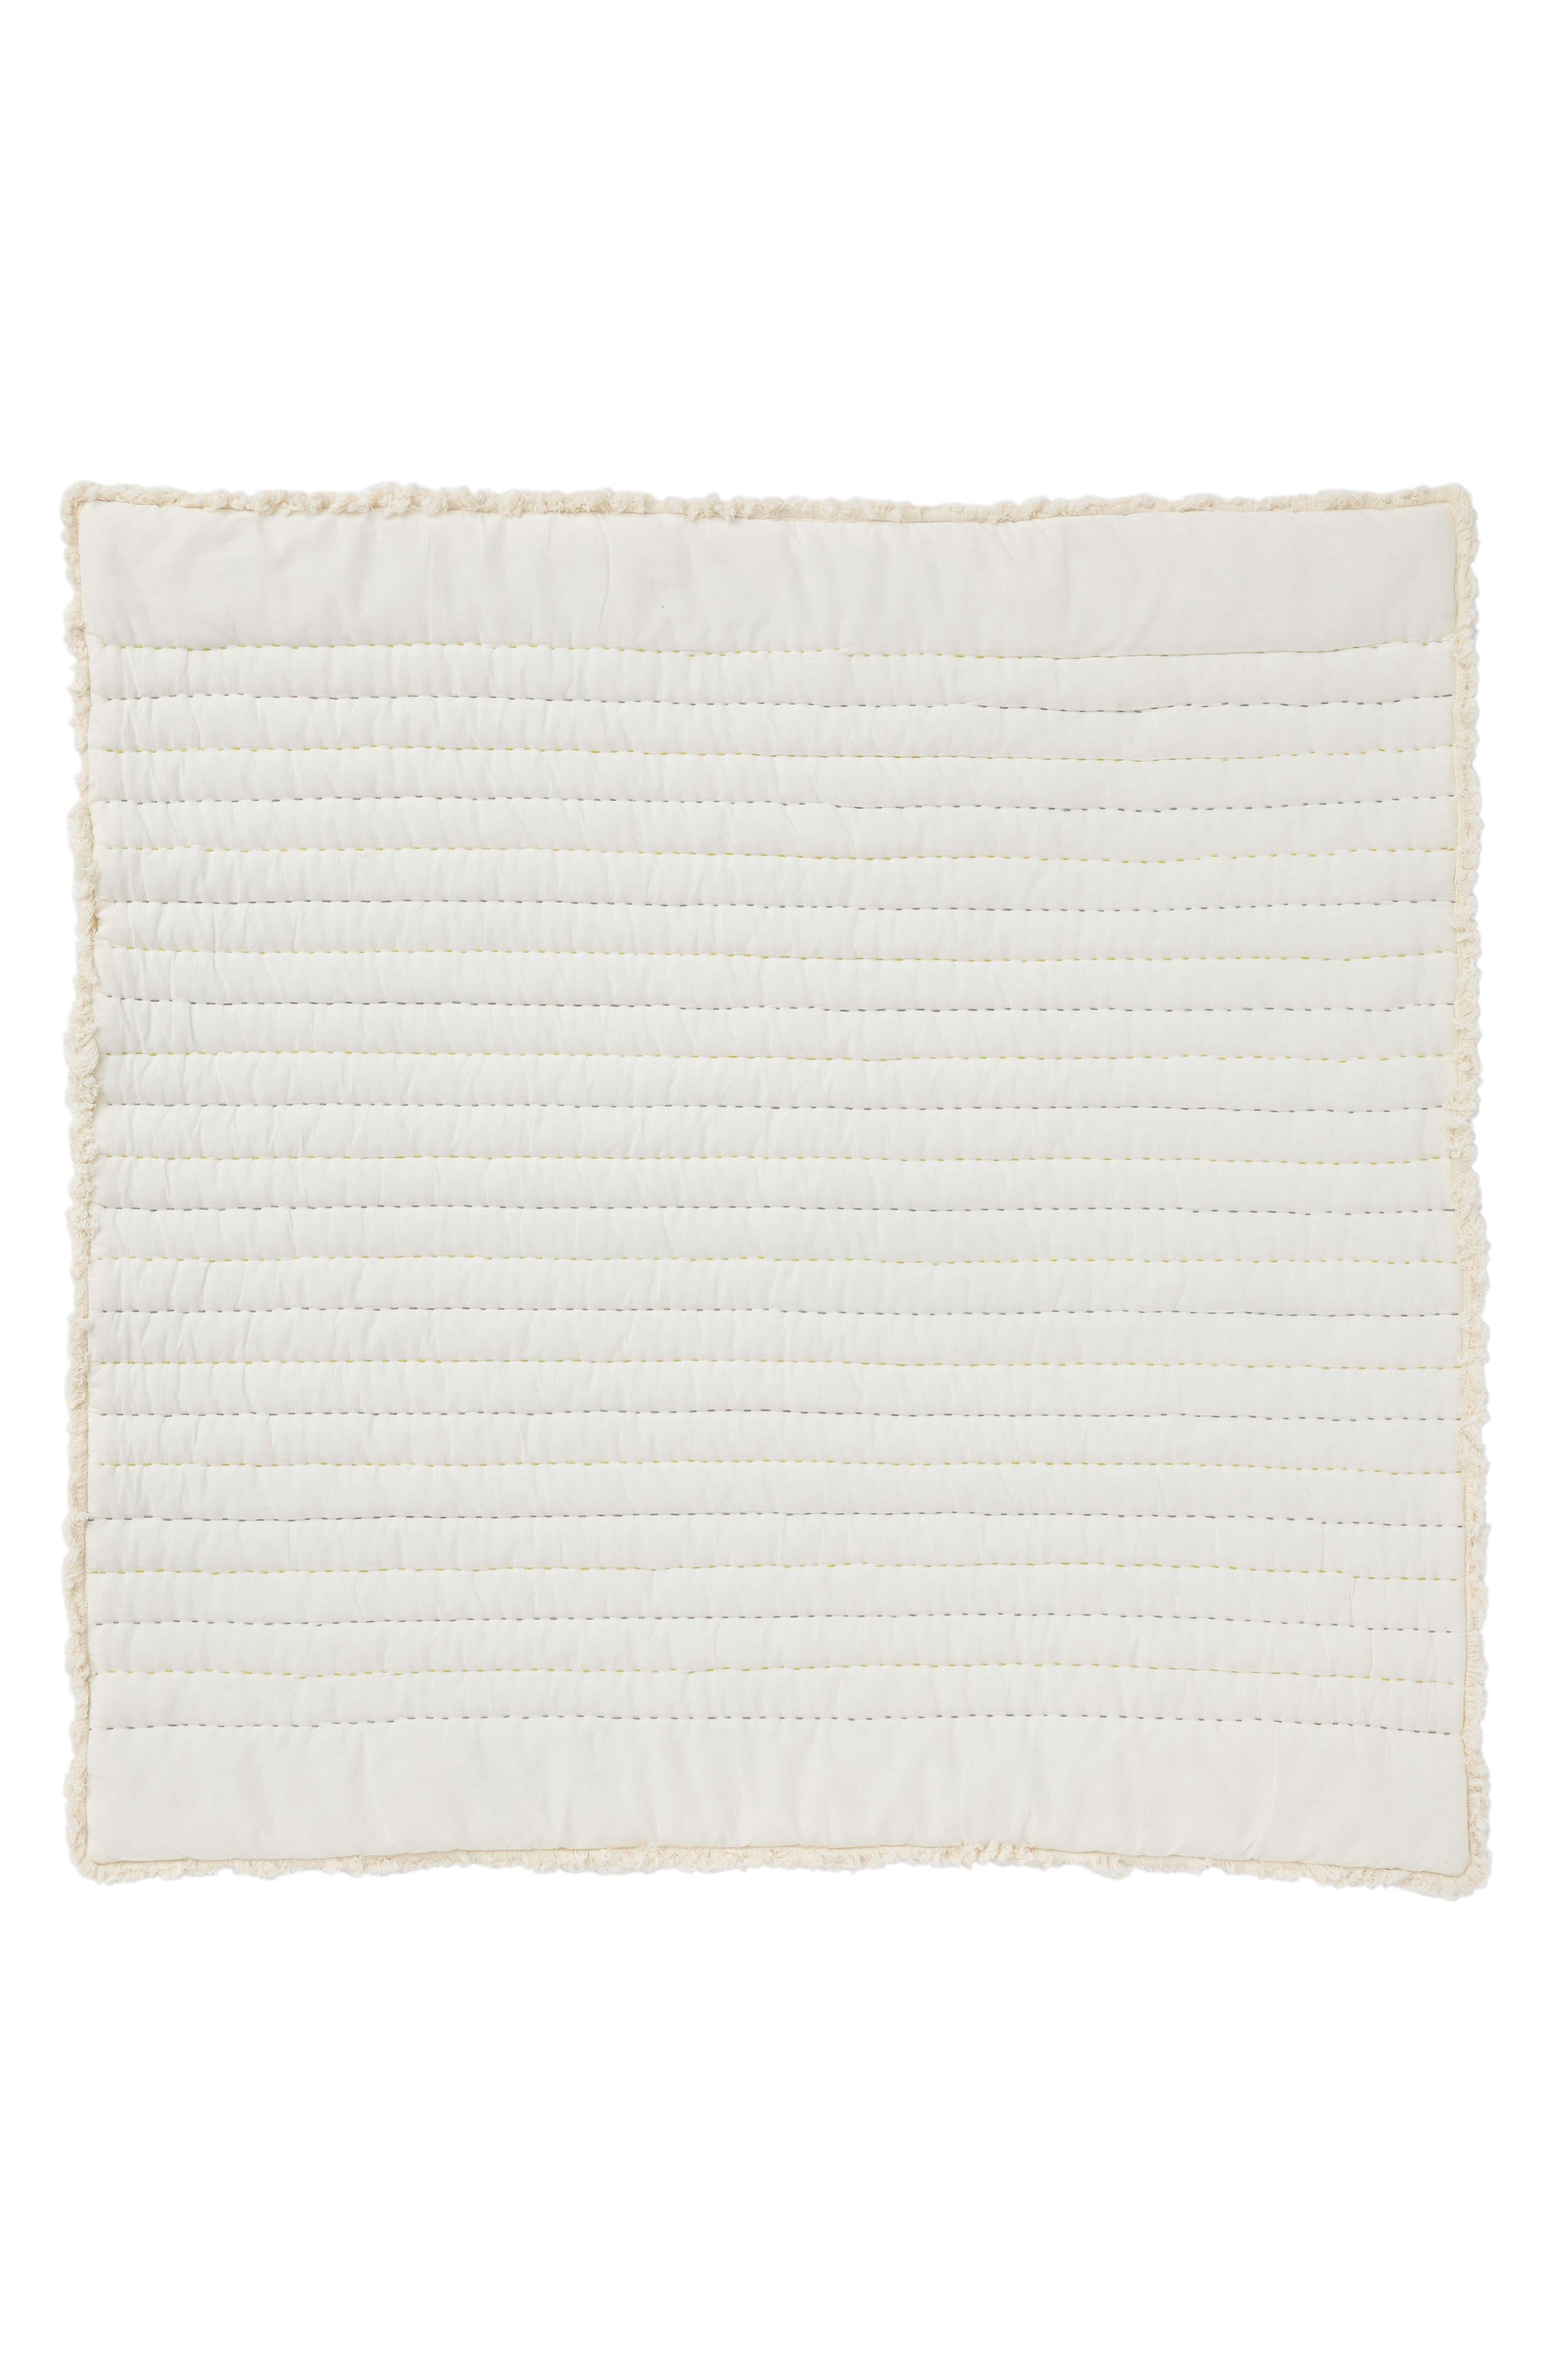 Little Peeps Play Blanket,                             Alternate thumbnail 2, color,                             GREY